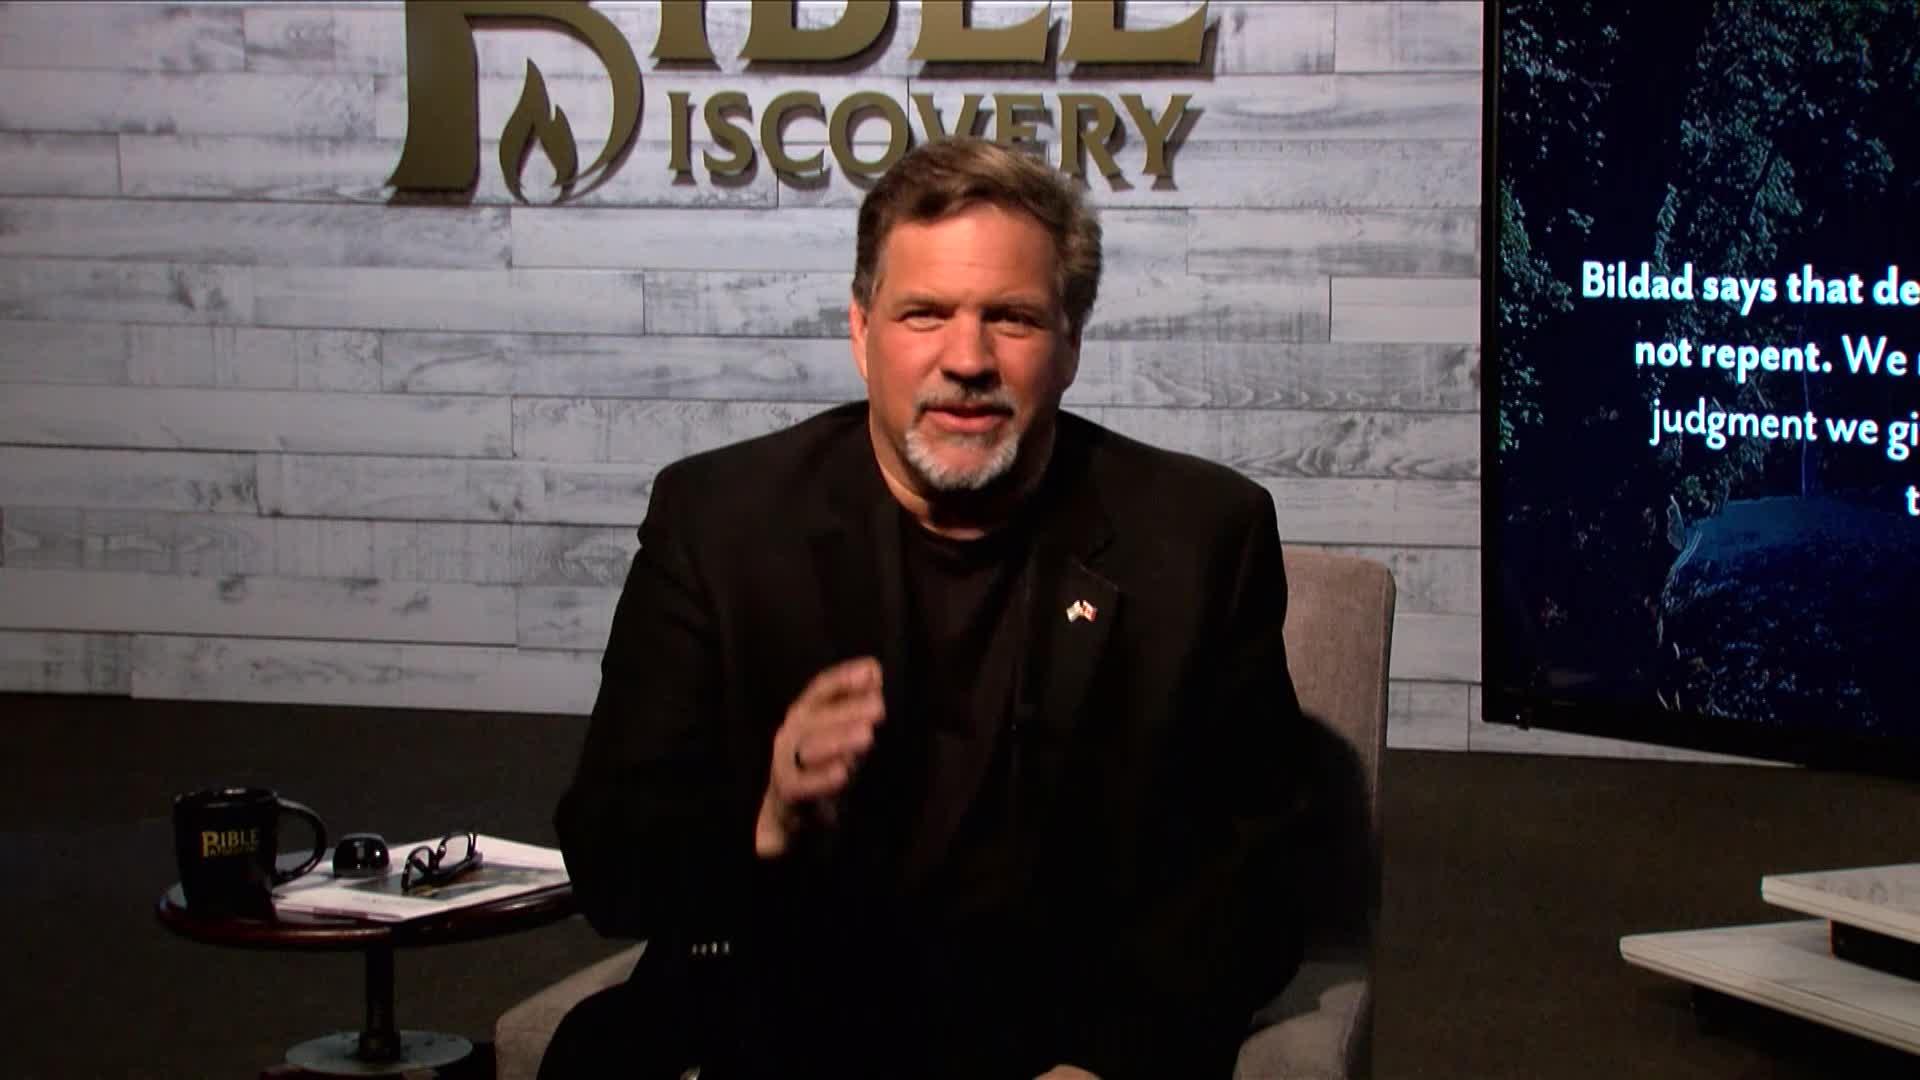 Bible Discovery - Job 18 Terror